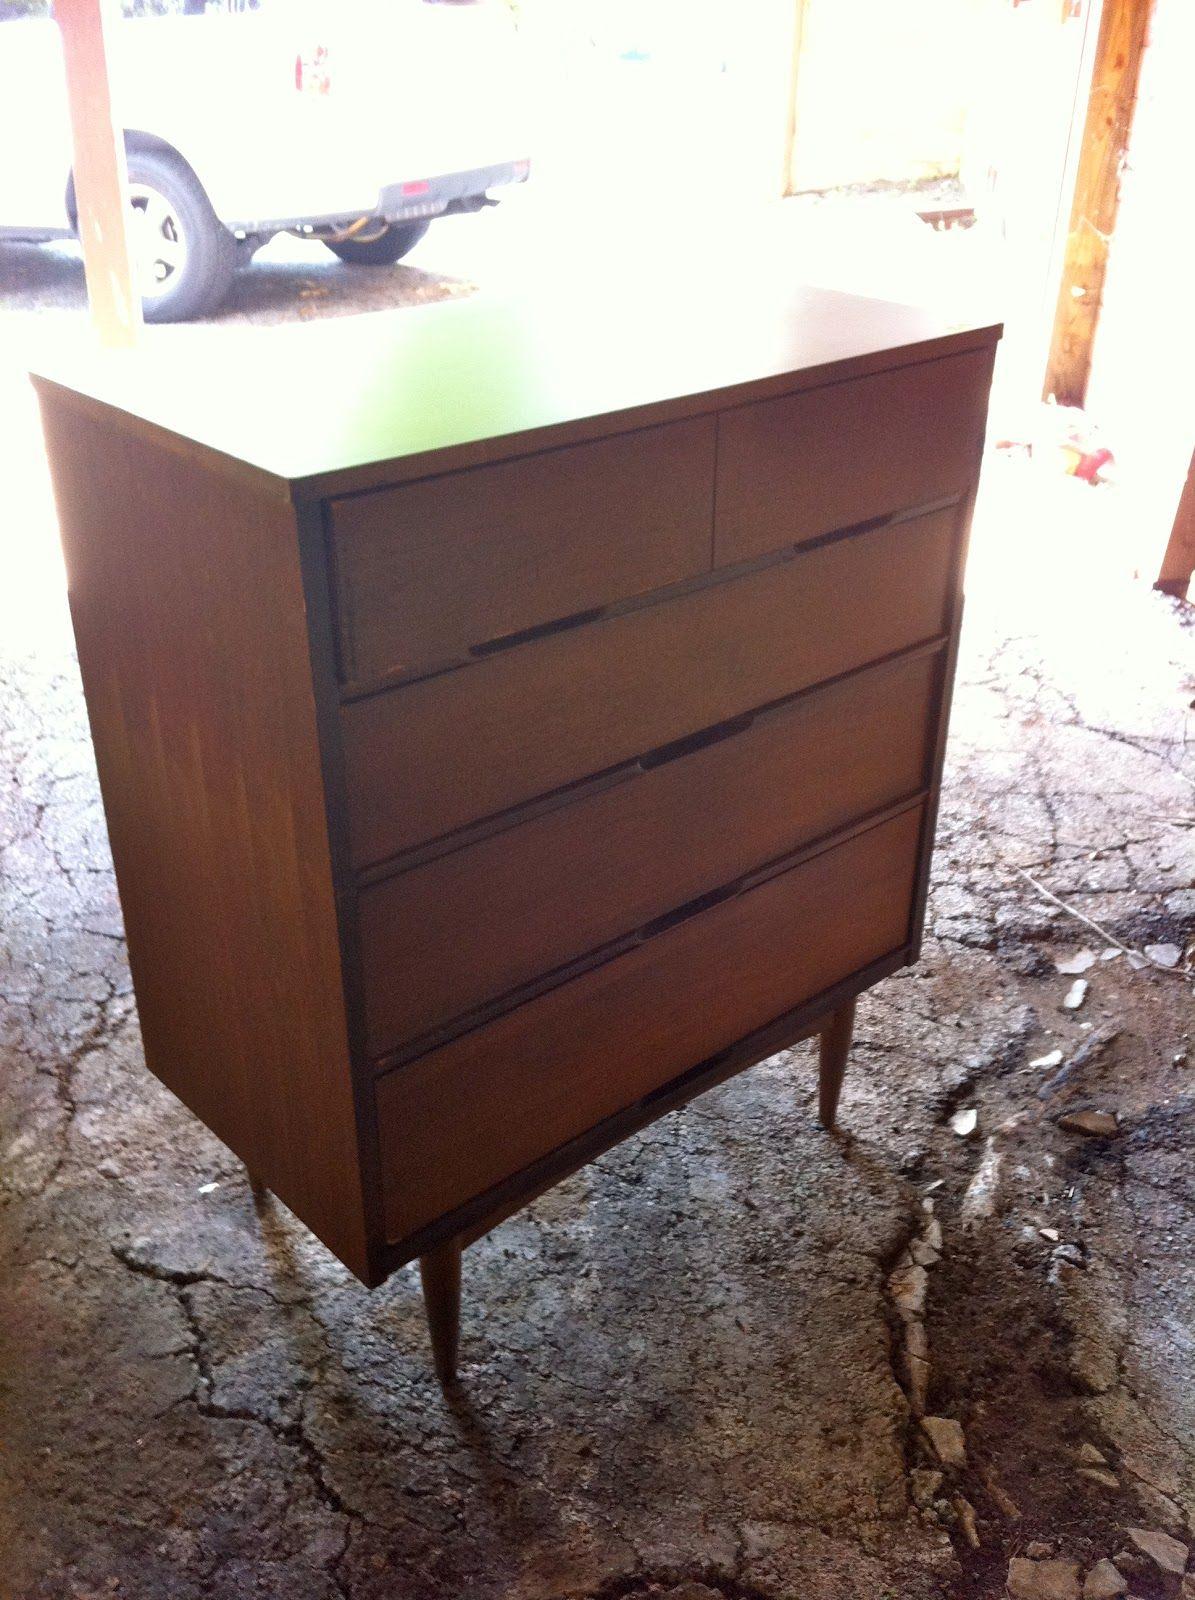 Best Steps To Refinishing Wood Furniture Refinish Wood 640 x 480